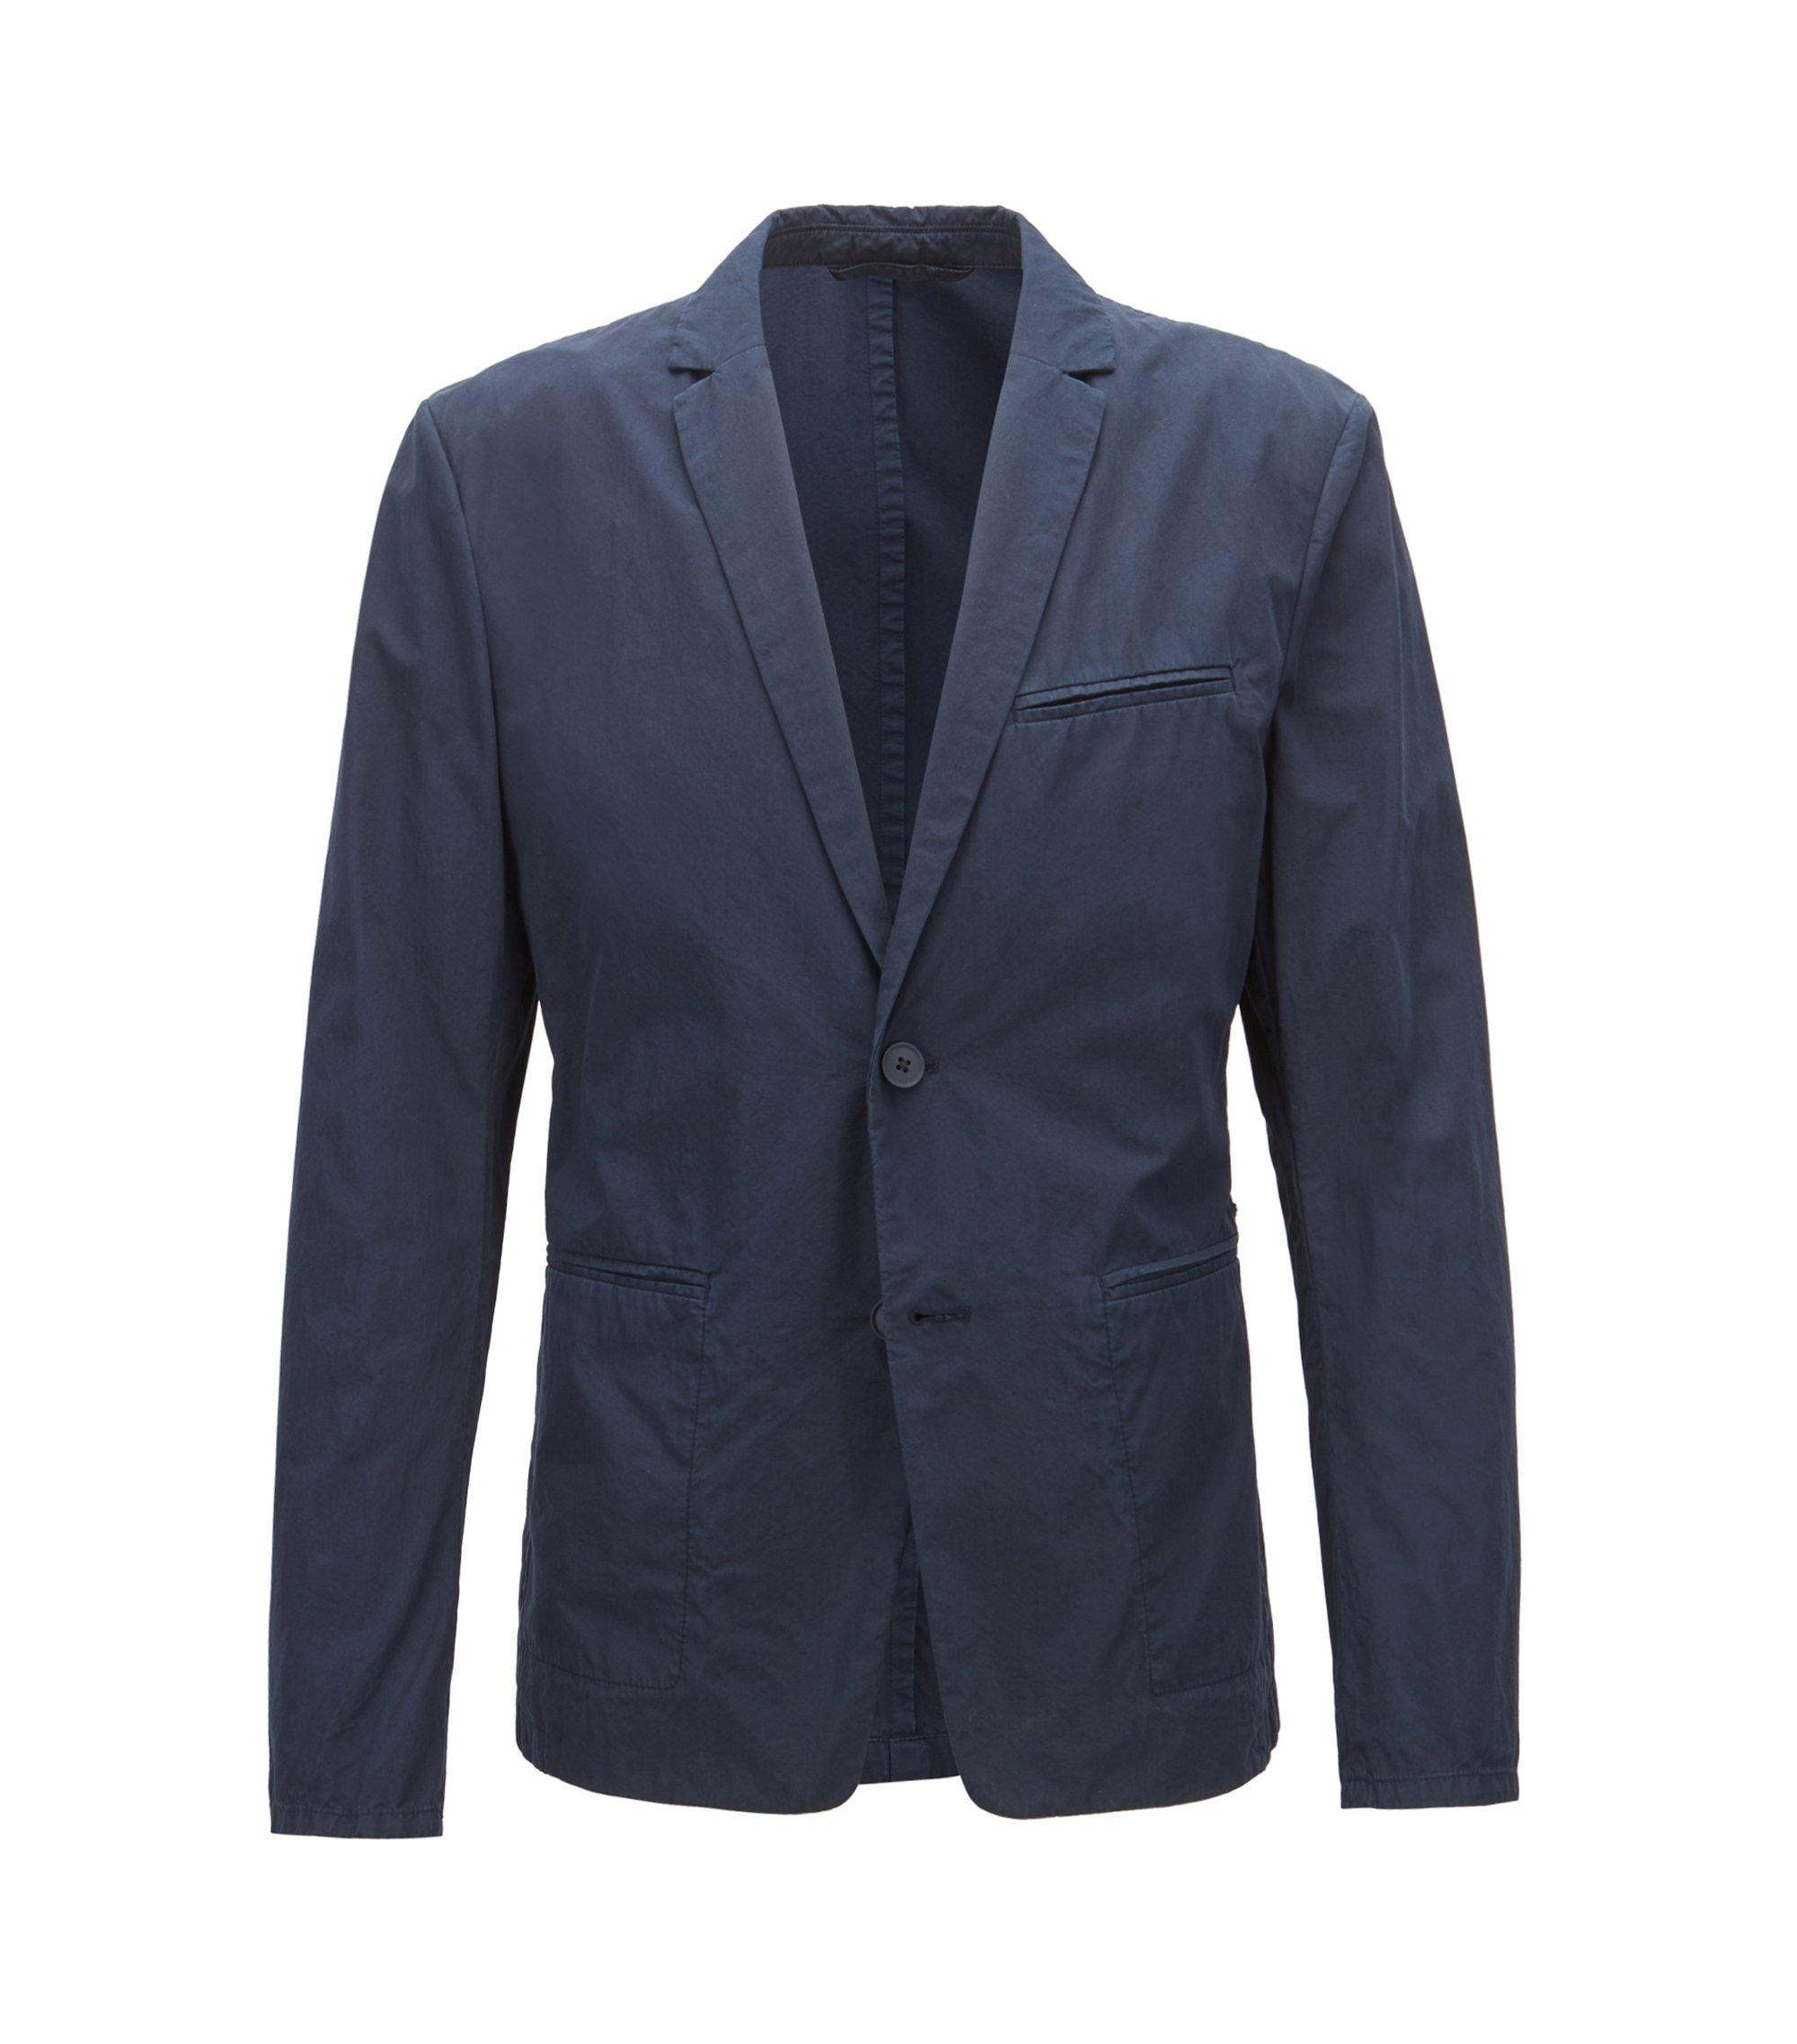 Blazer slim fit en popelín de algodón italiano con teñido especial, Azul oscuro